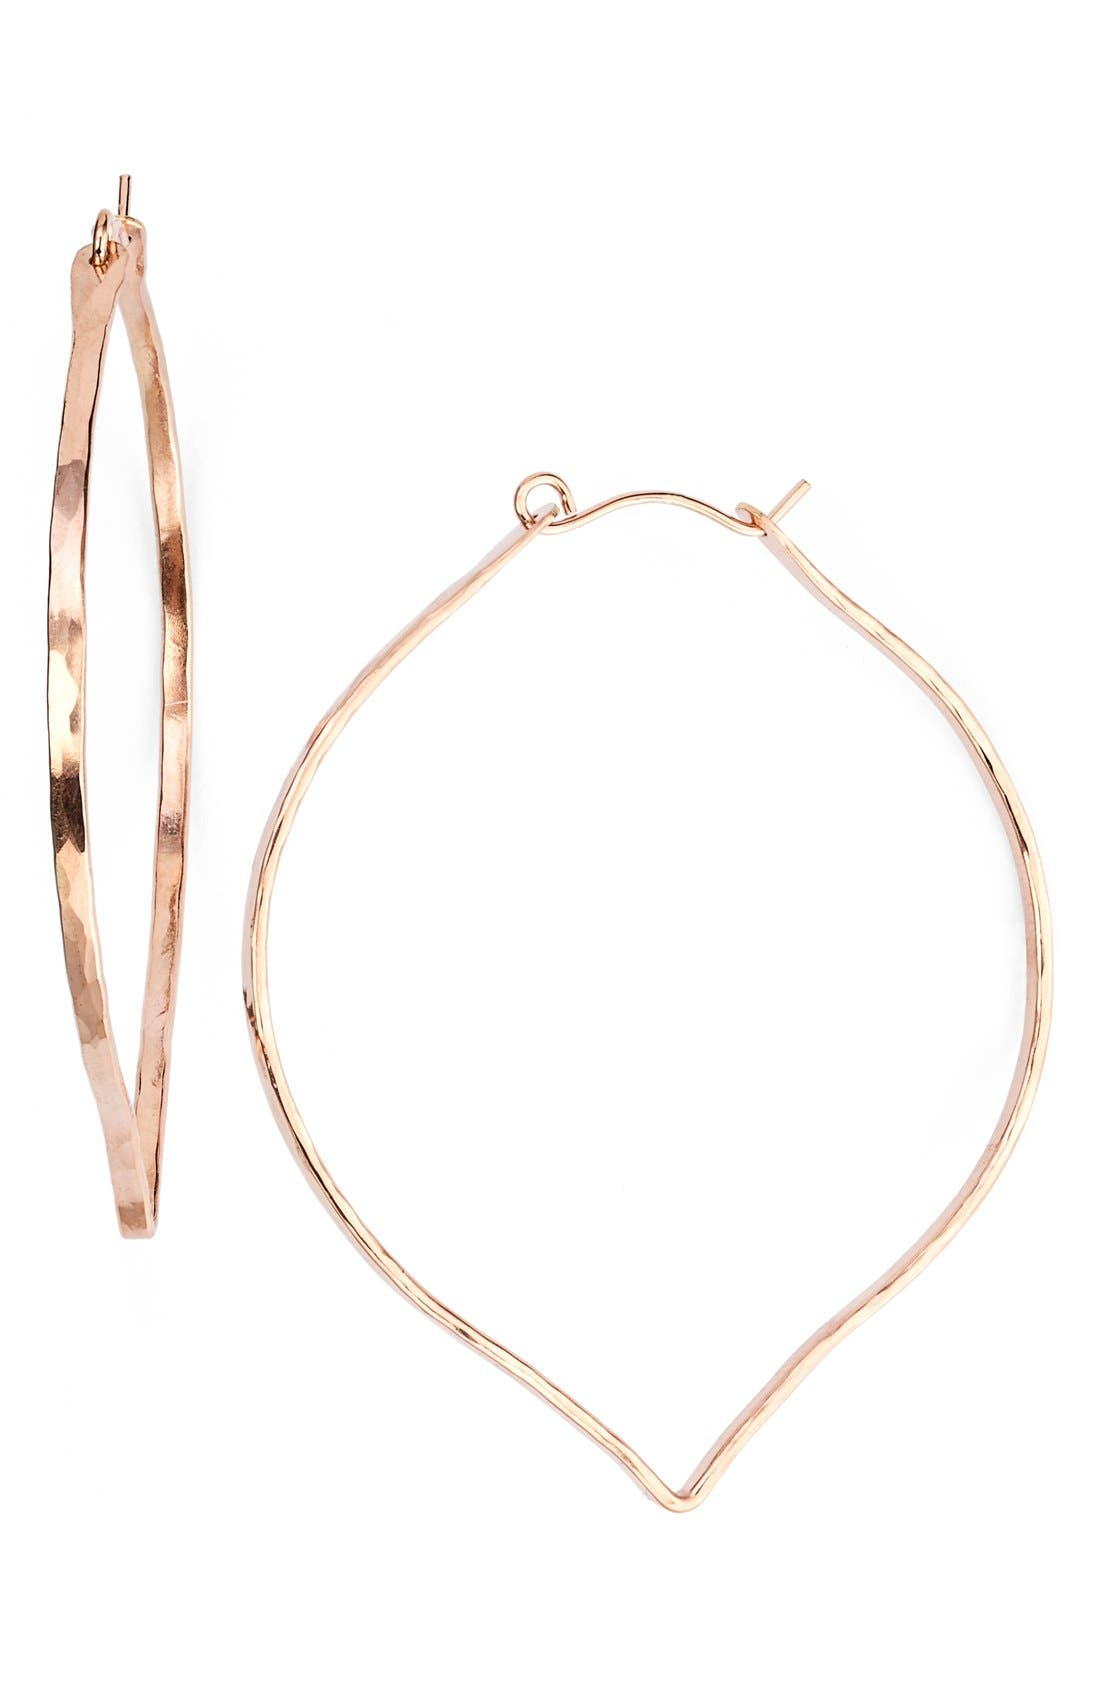 Alternate Image 1 Selected - Ija 'Large' 14k-Rose Gold Fill Lotus Hoop Earrings